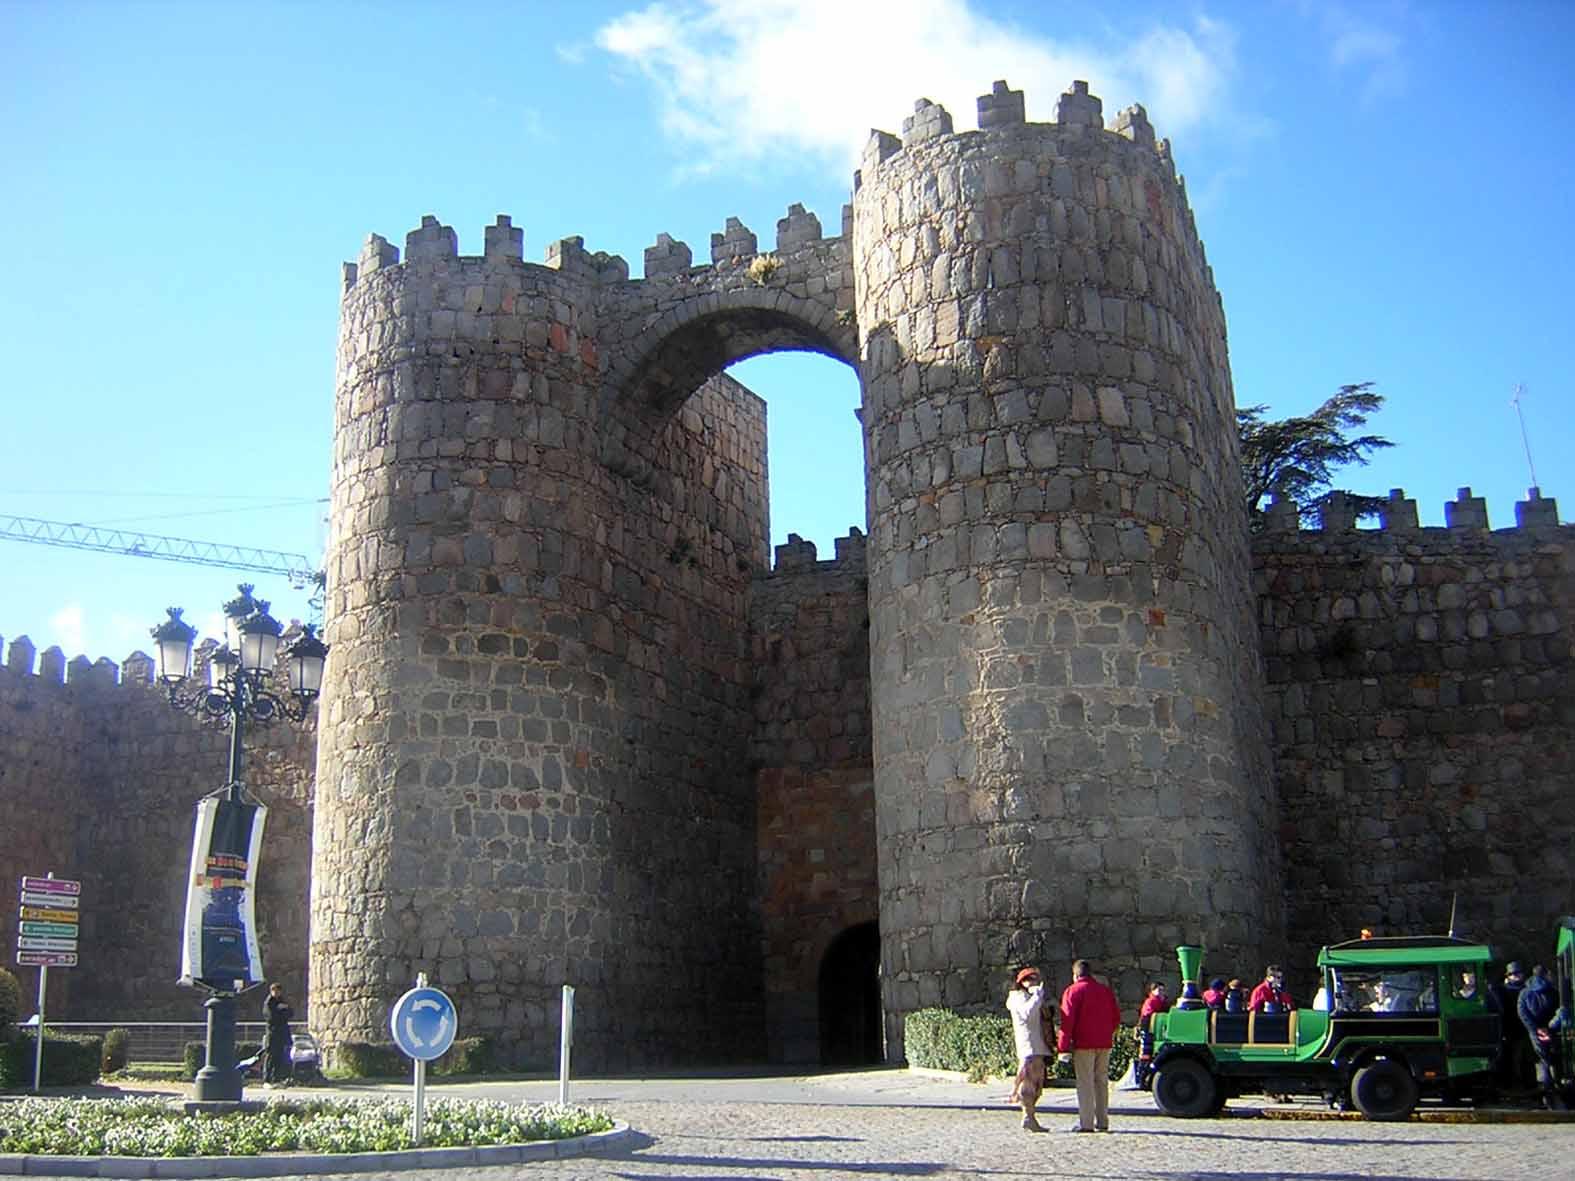 Porta da muralha de Ávila